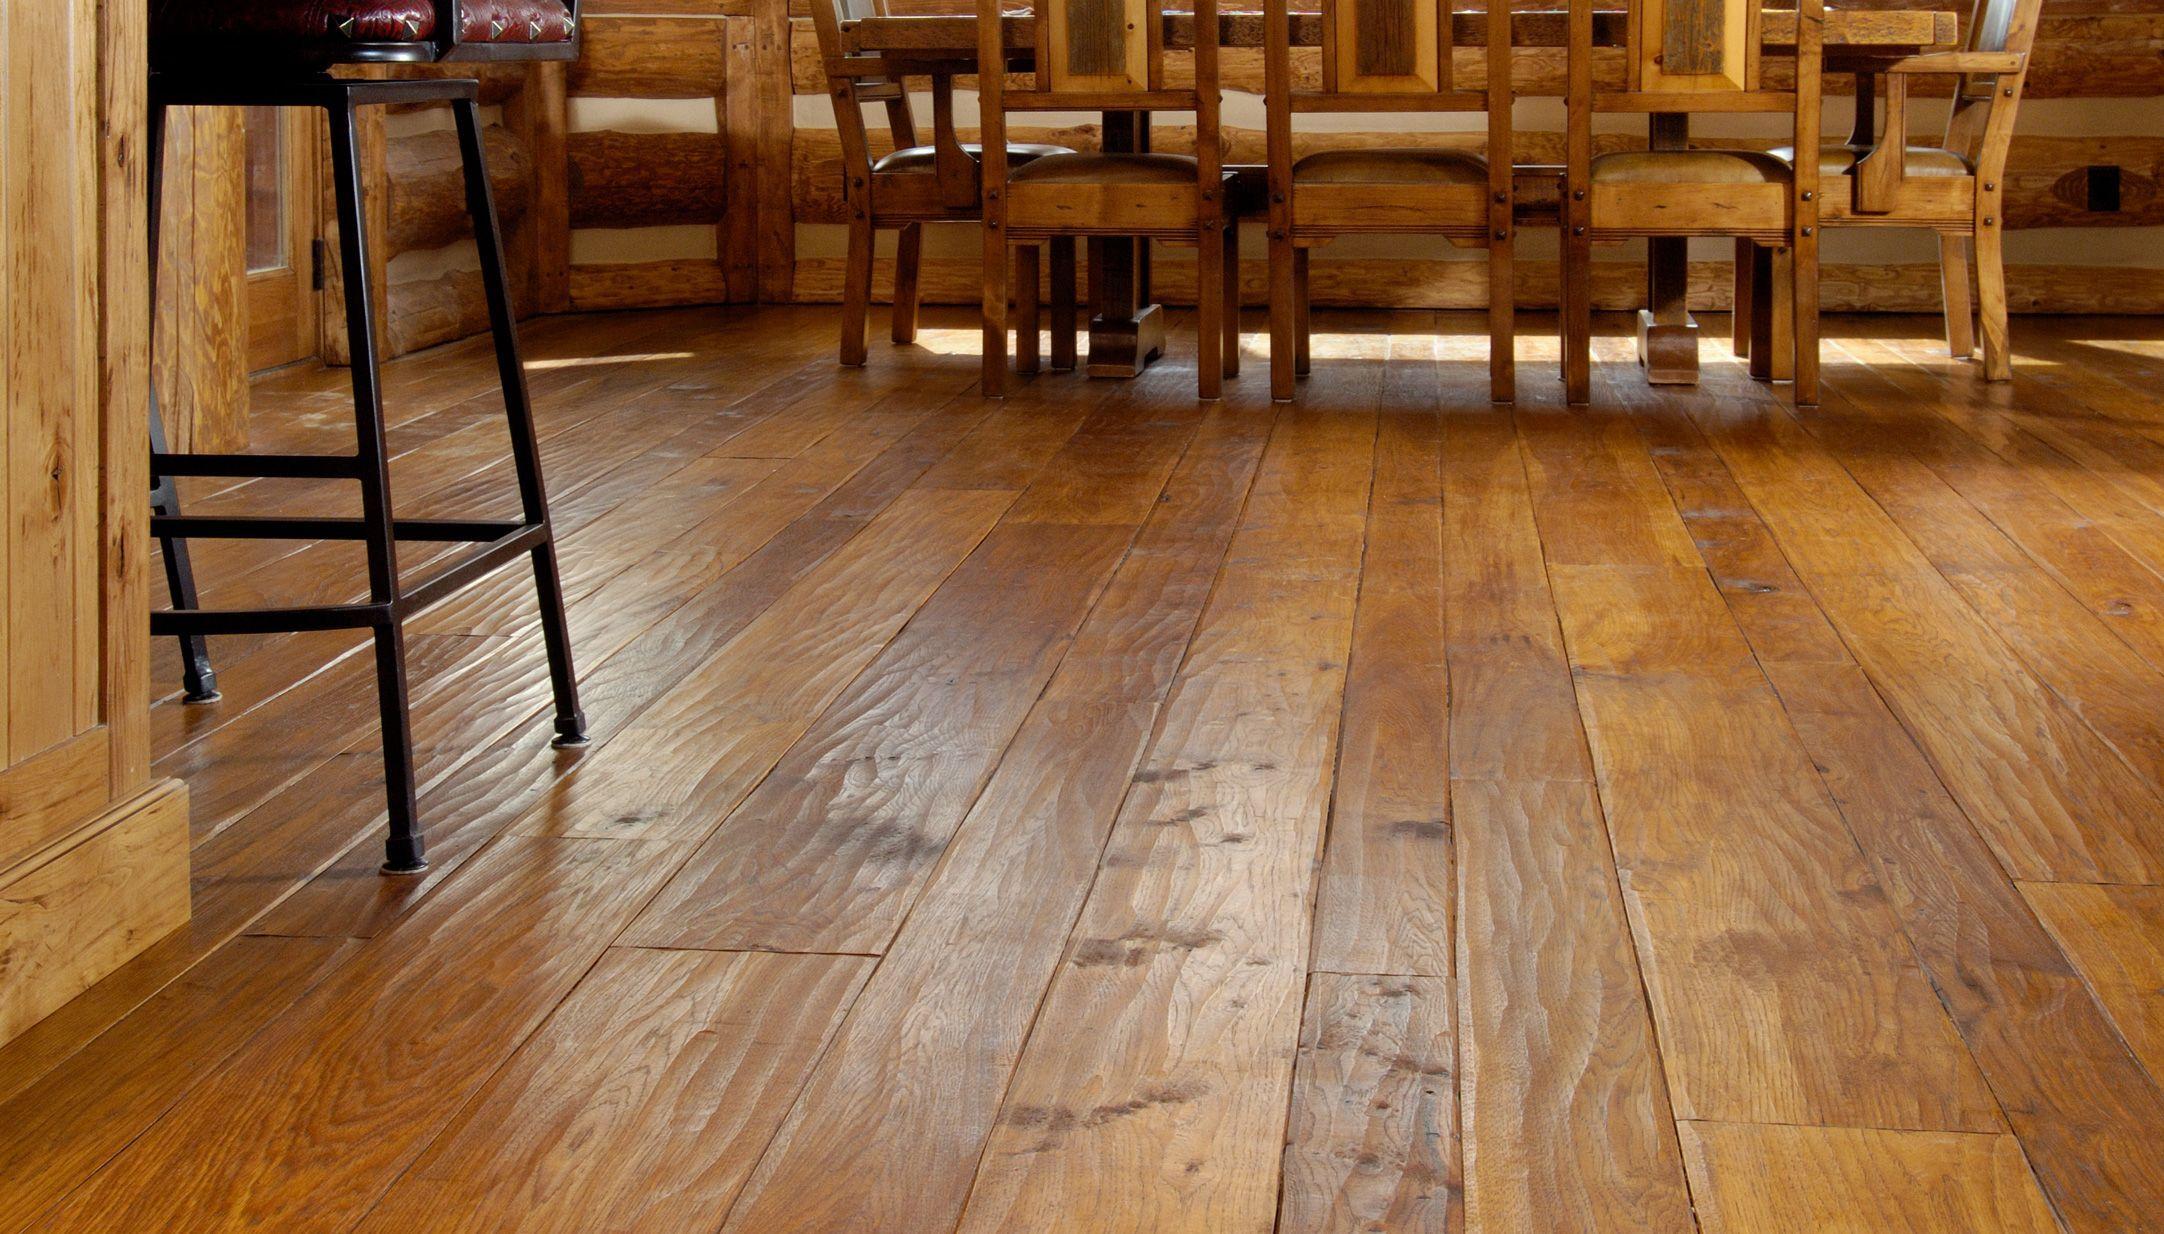 Hickory Hardwood Flooring and Distressed Wood Flooring from Carlisle Wide Plank Floors